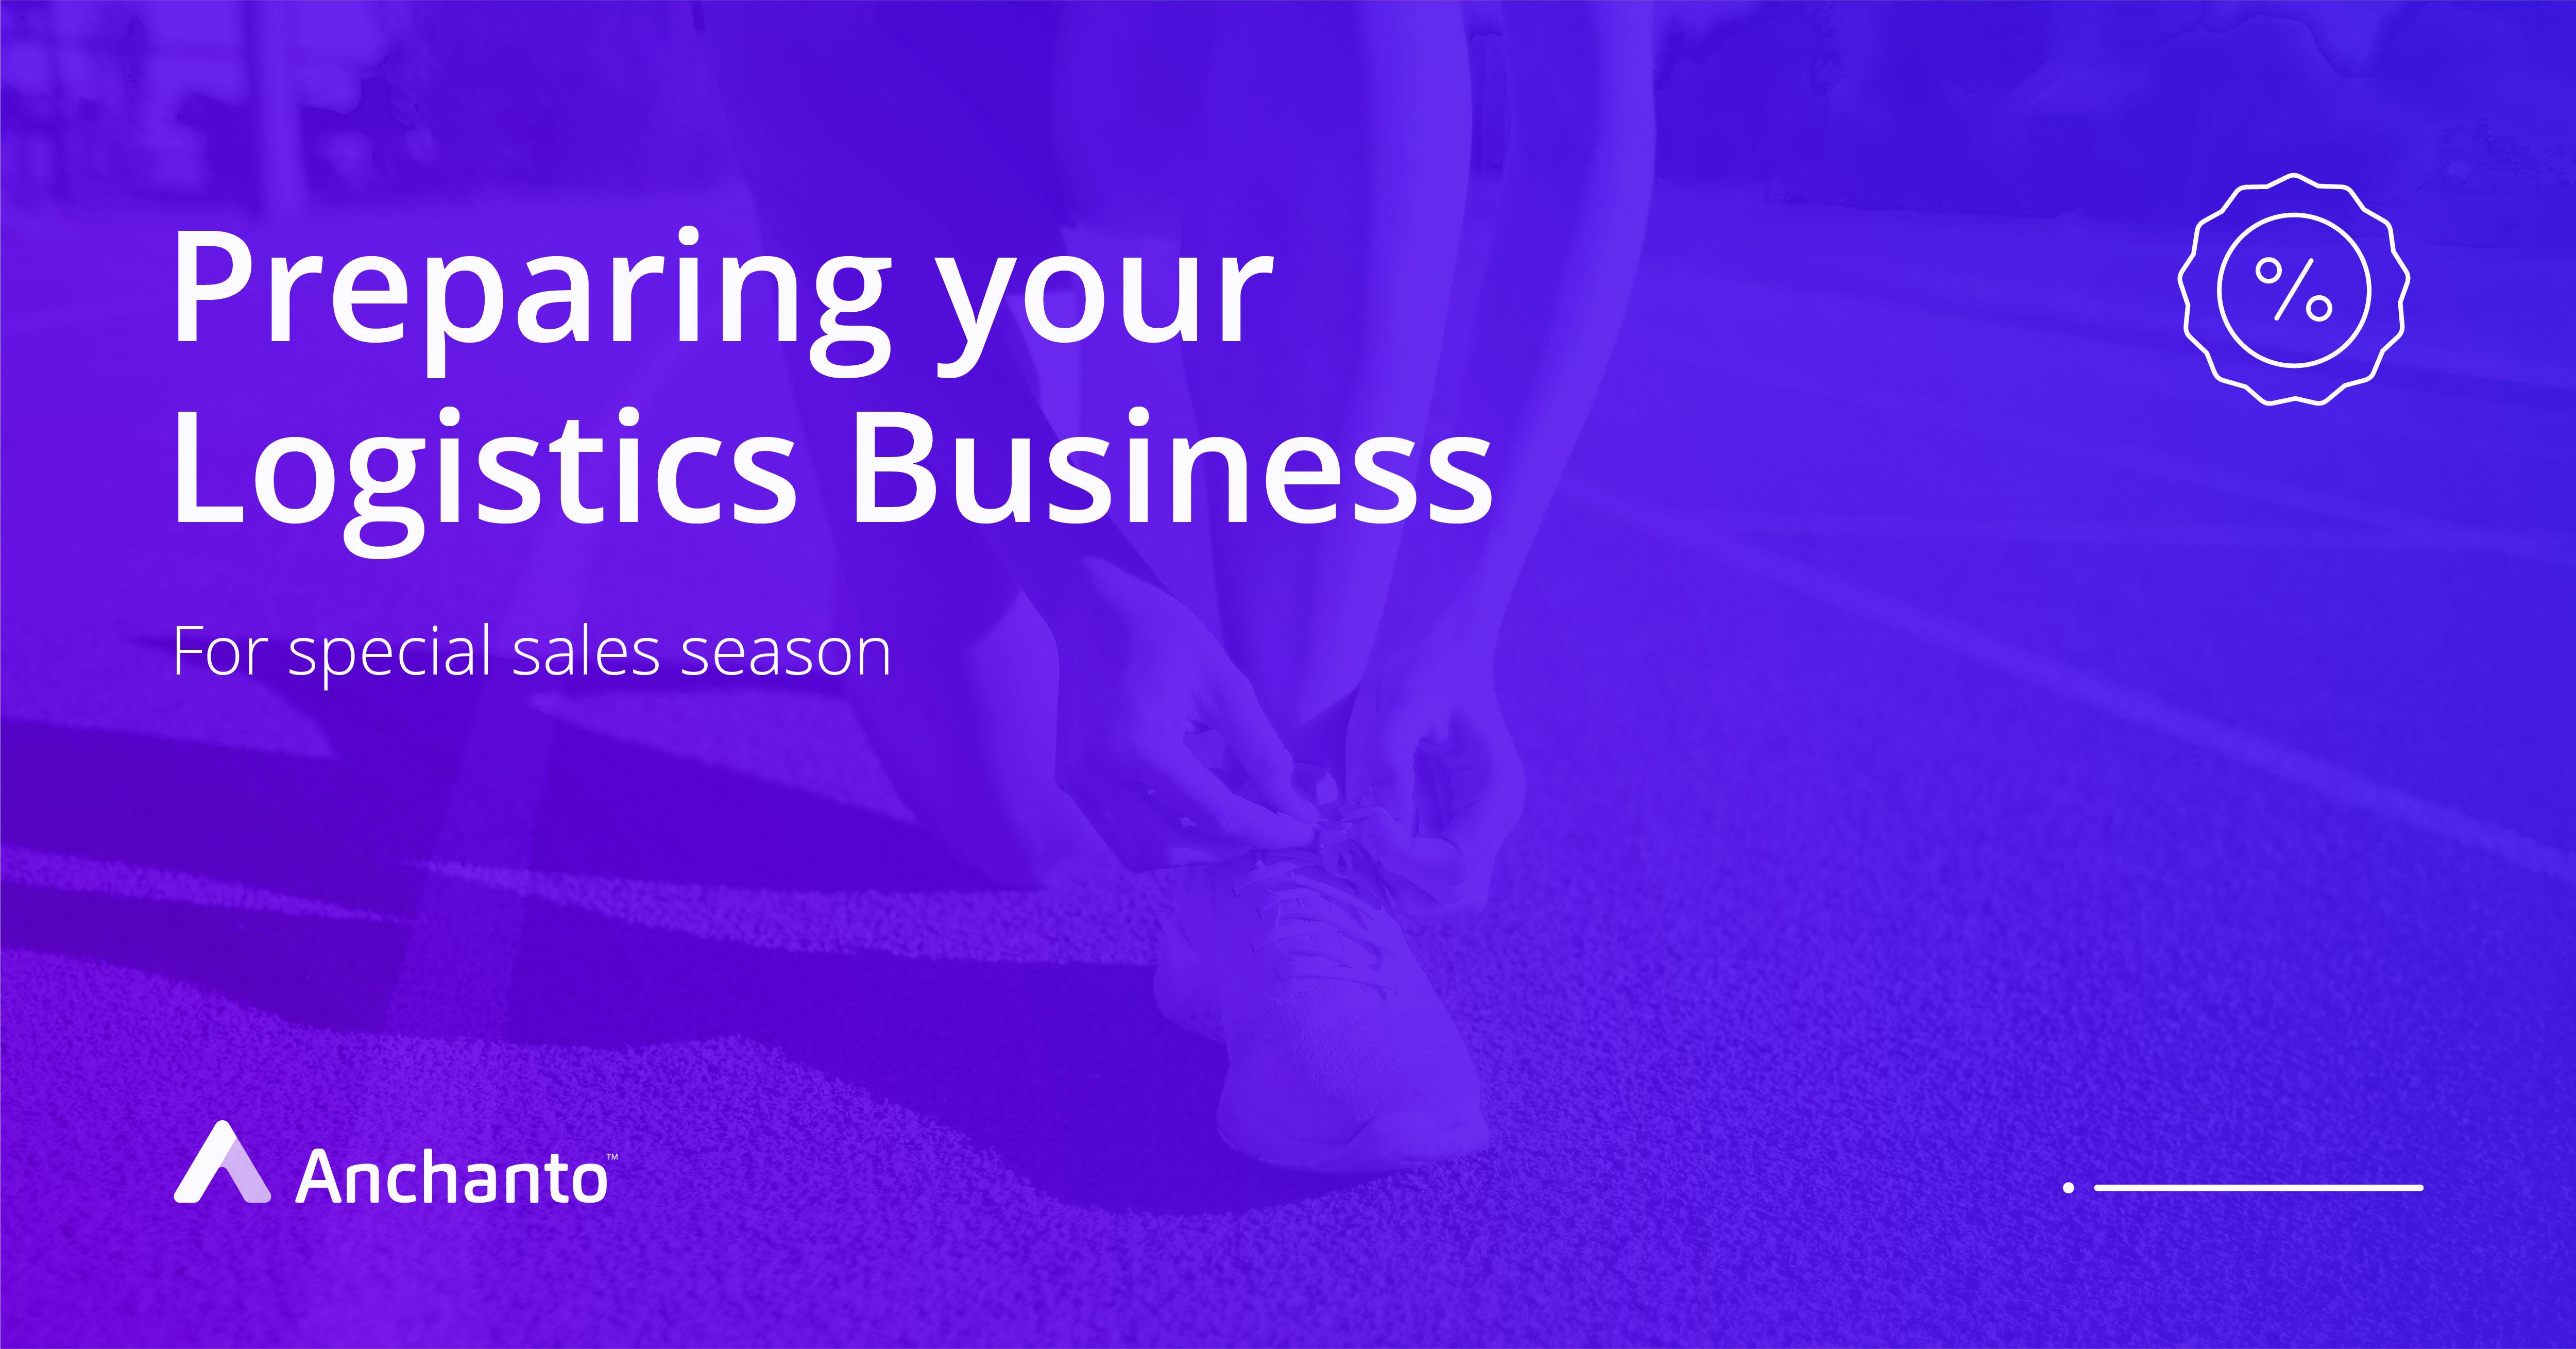 logistics_businesses_ready_for_sales_season